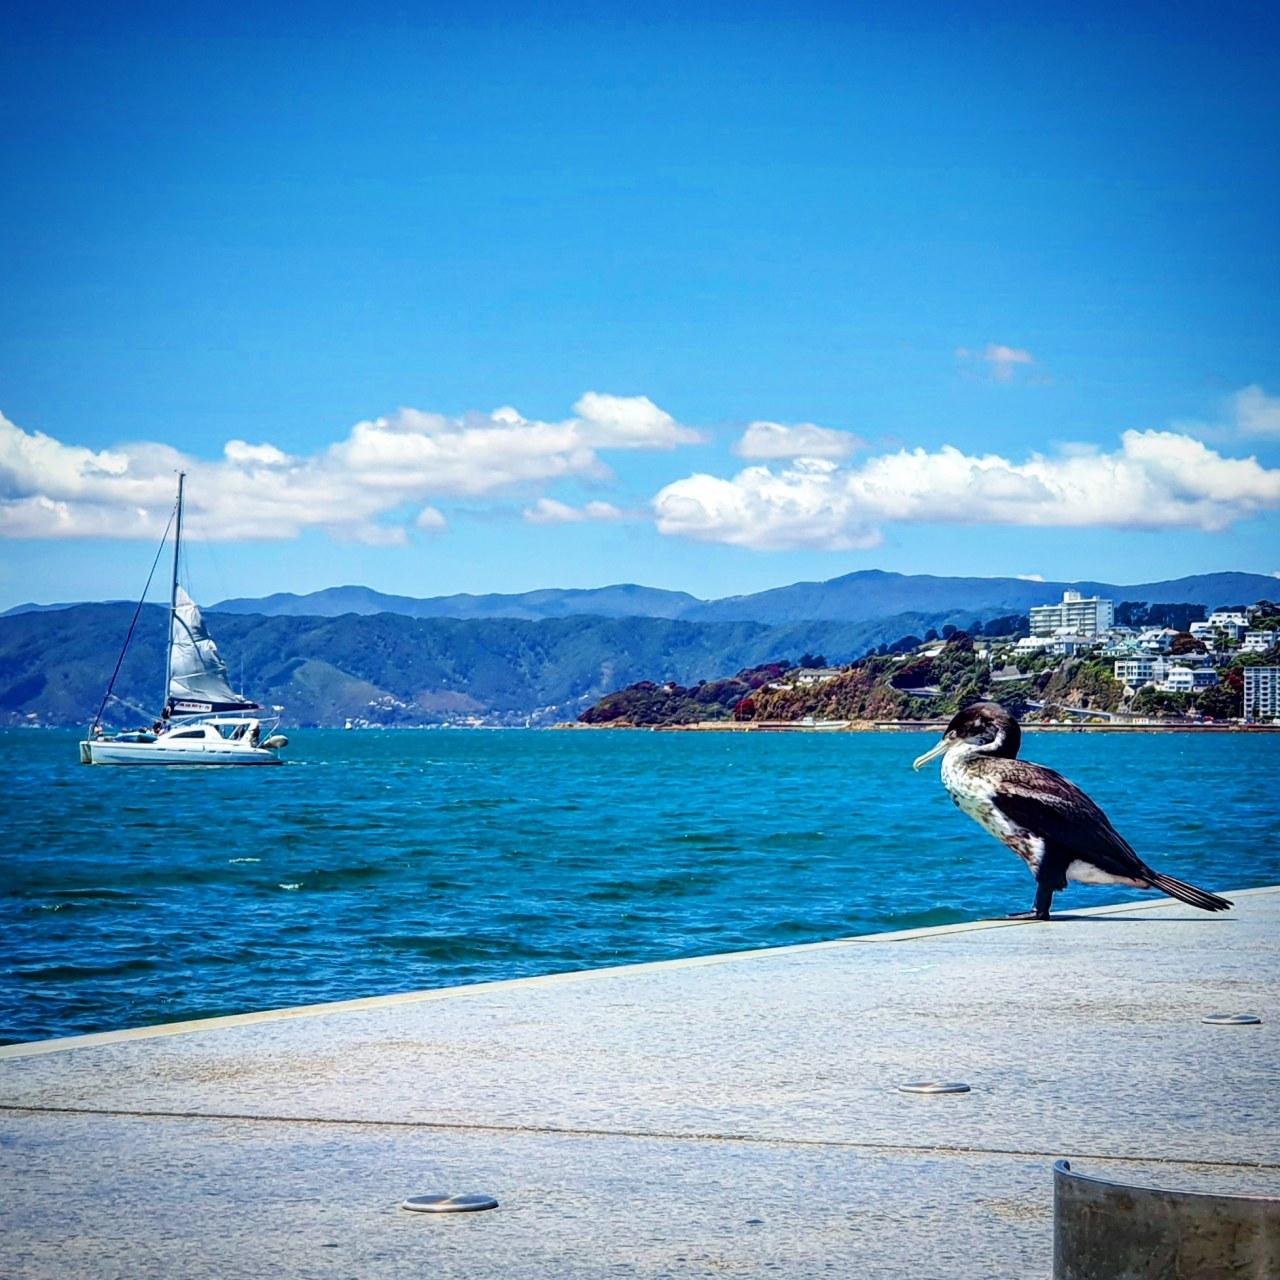 Day 120: Love Welly – WaterfrontWanderings